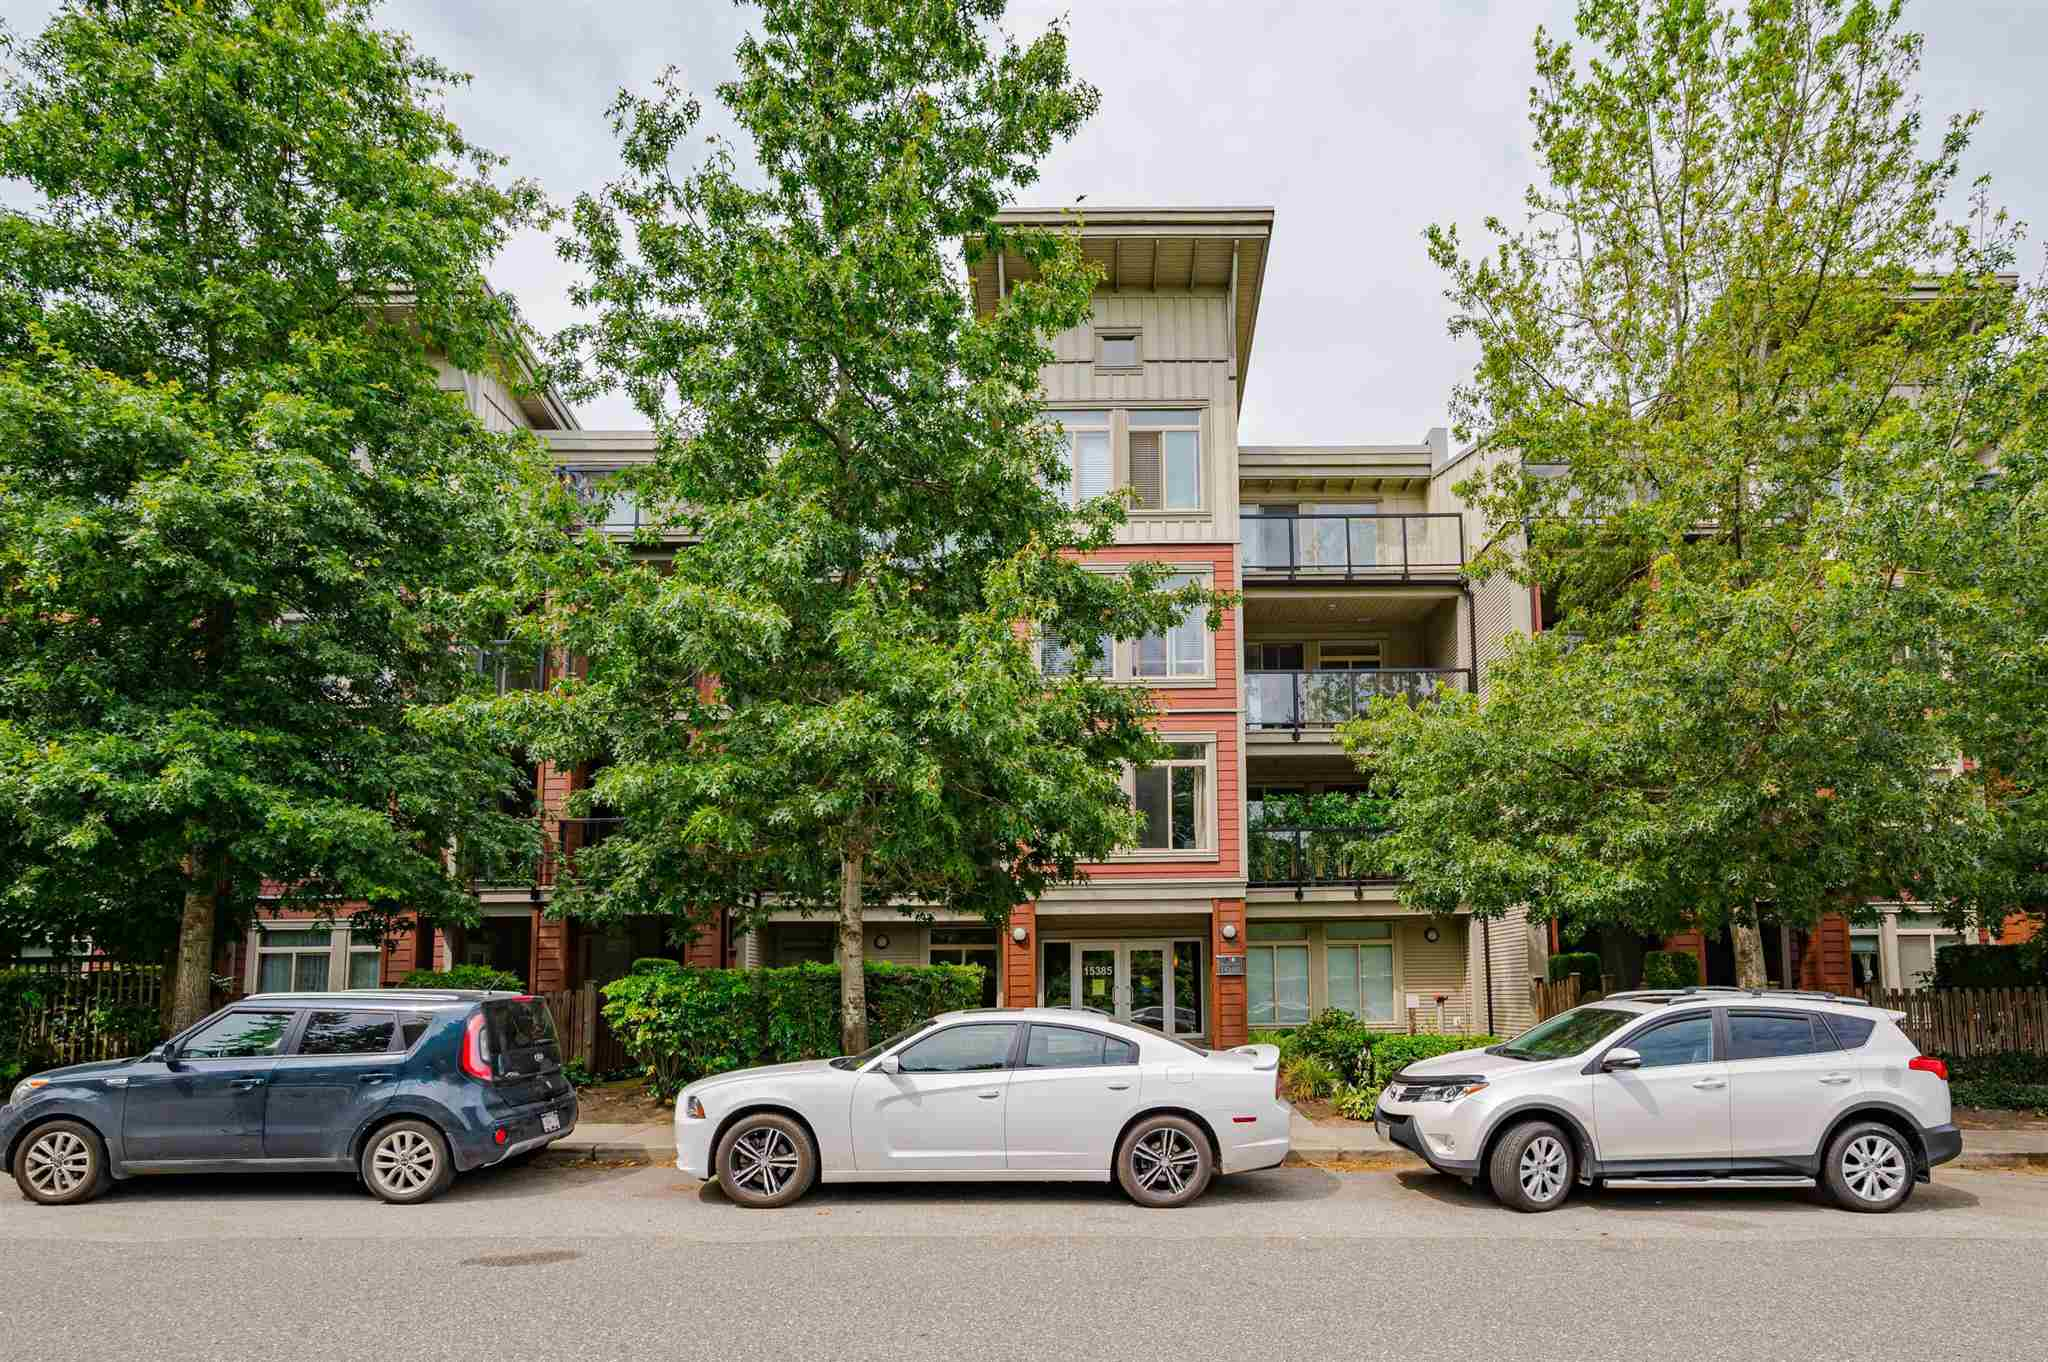 104 15385 101A AVENUE - Guildford Apartment/Condo for sale, 1 Bedroom (R2601711)